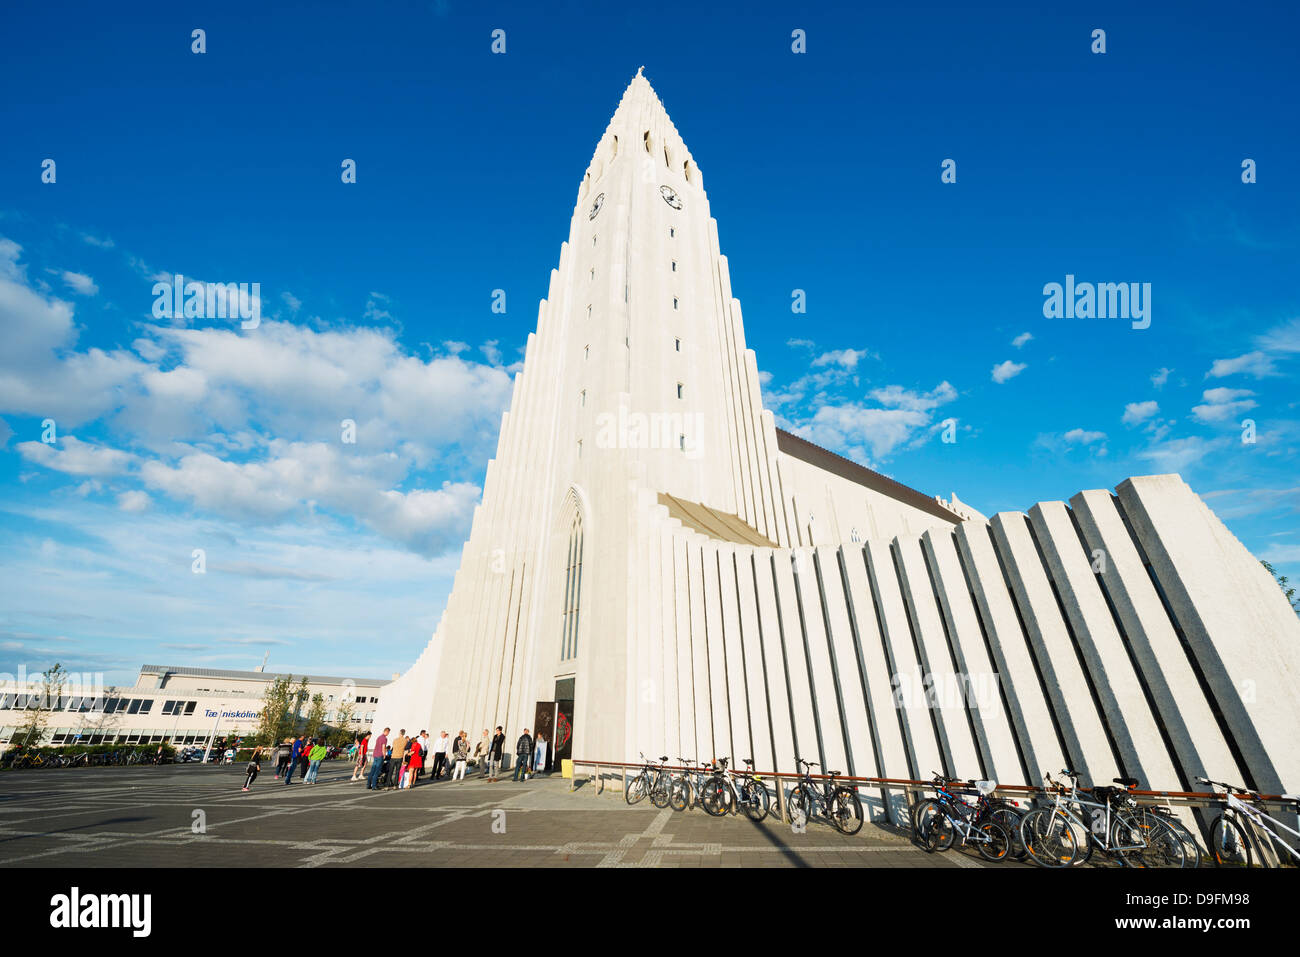 Chiesa Hallgrimskirkja, Reykjavik, Islanda, regioni polari Immagini Stock